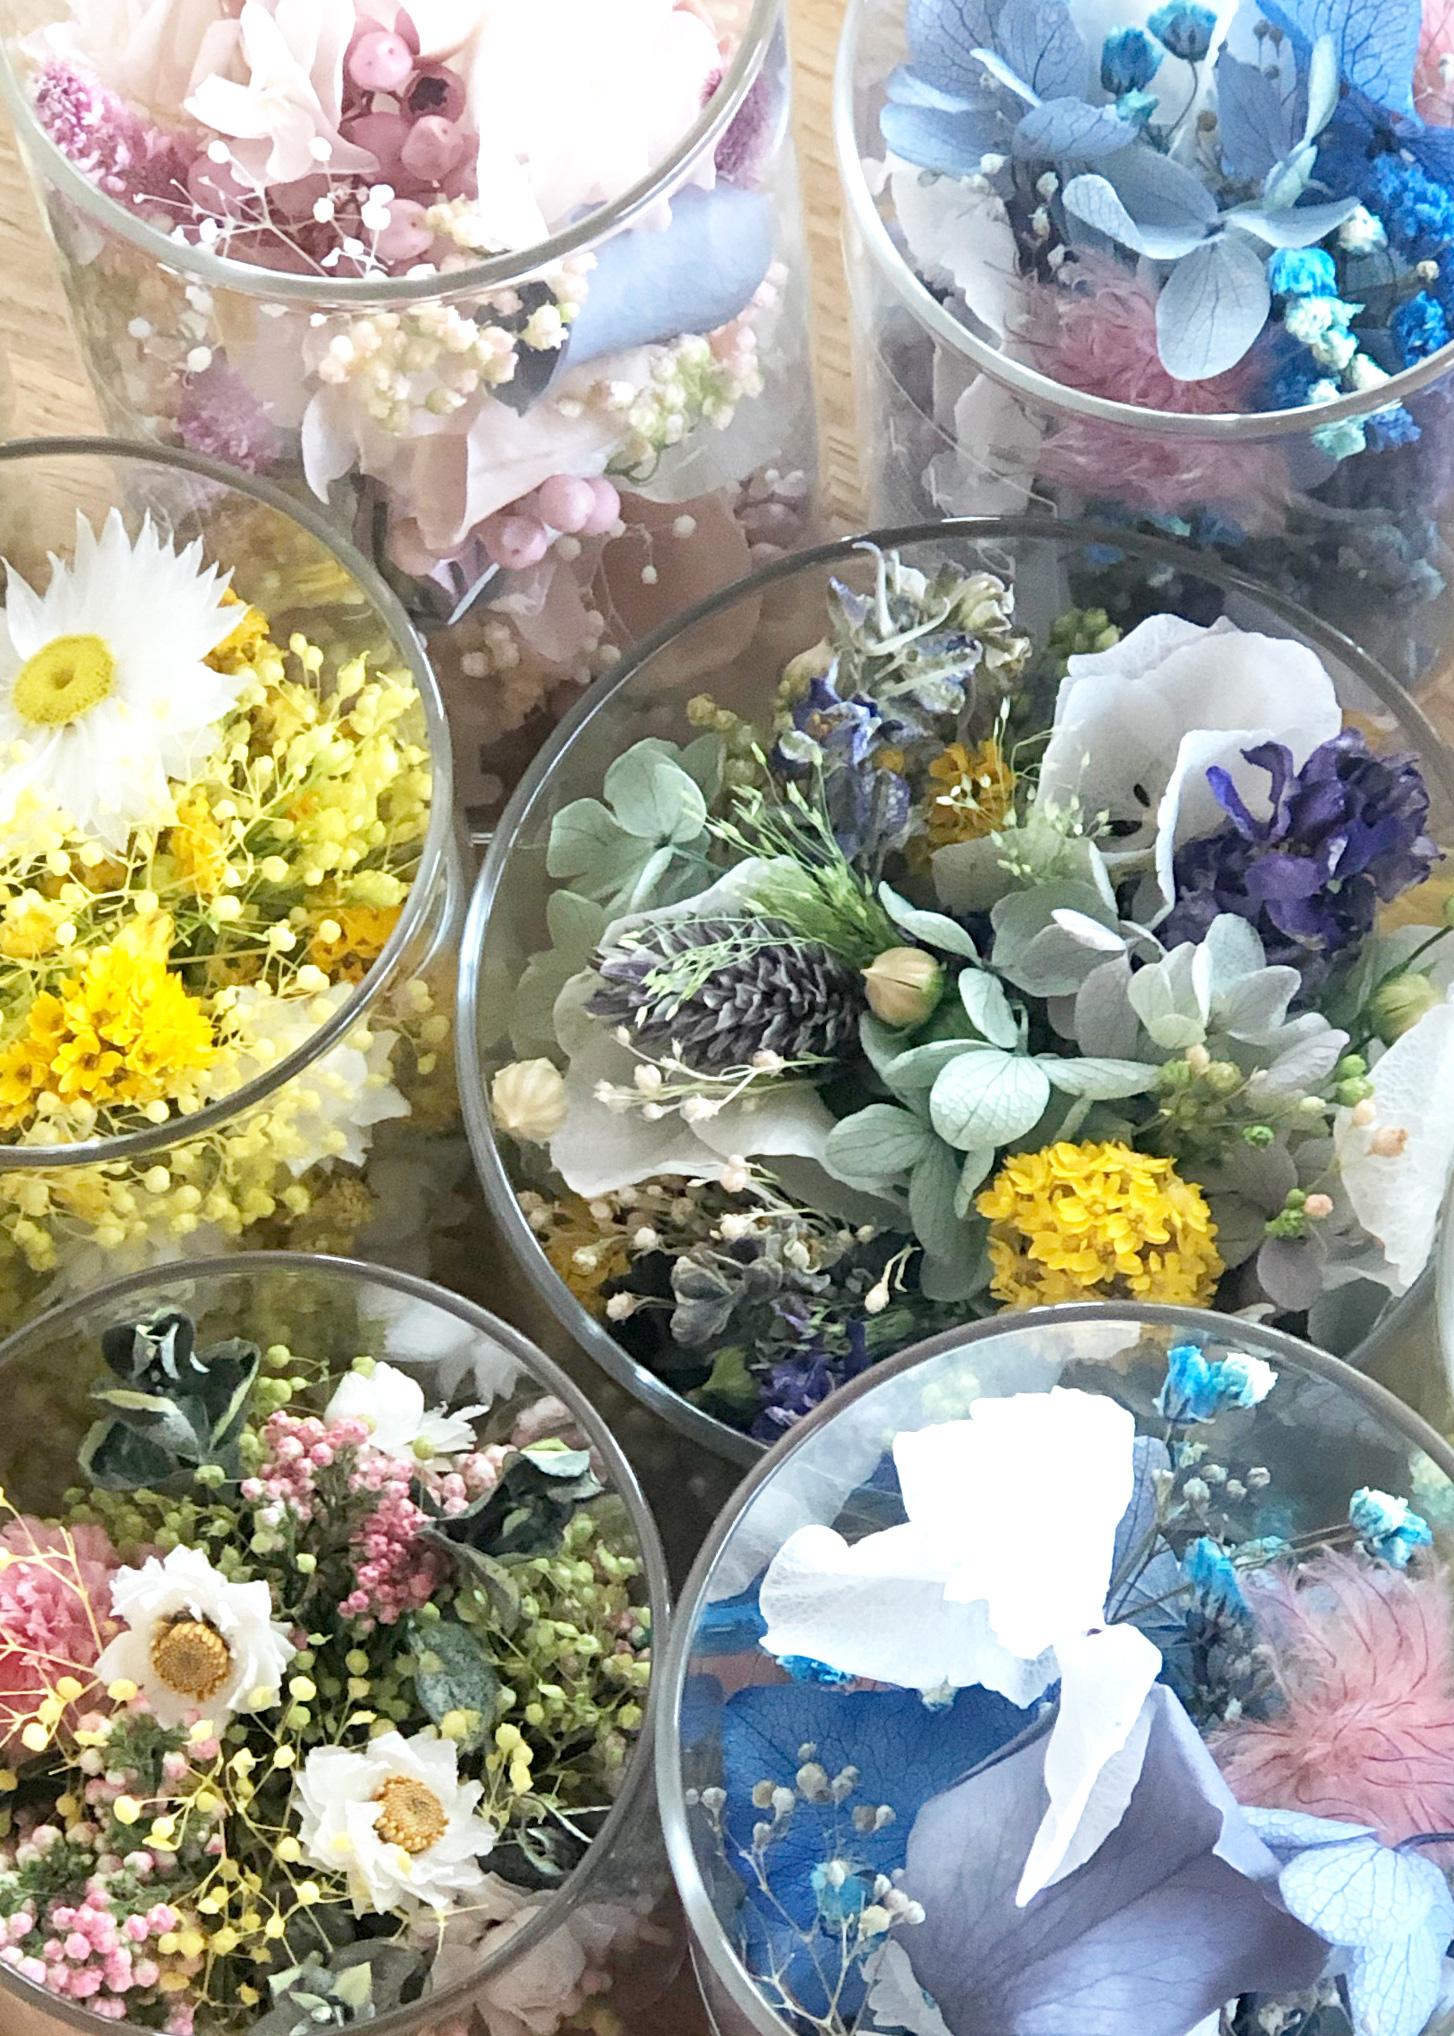 hikka 春のギフト 花咲くアロマブルーム